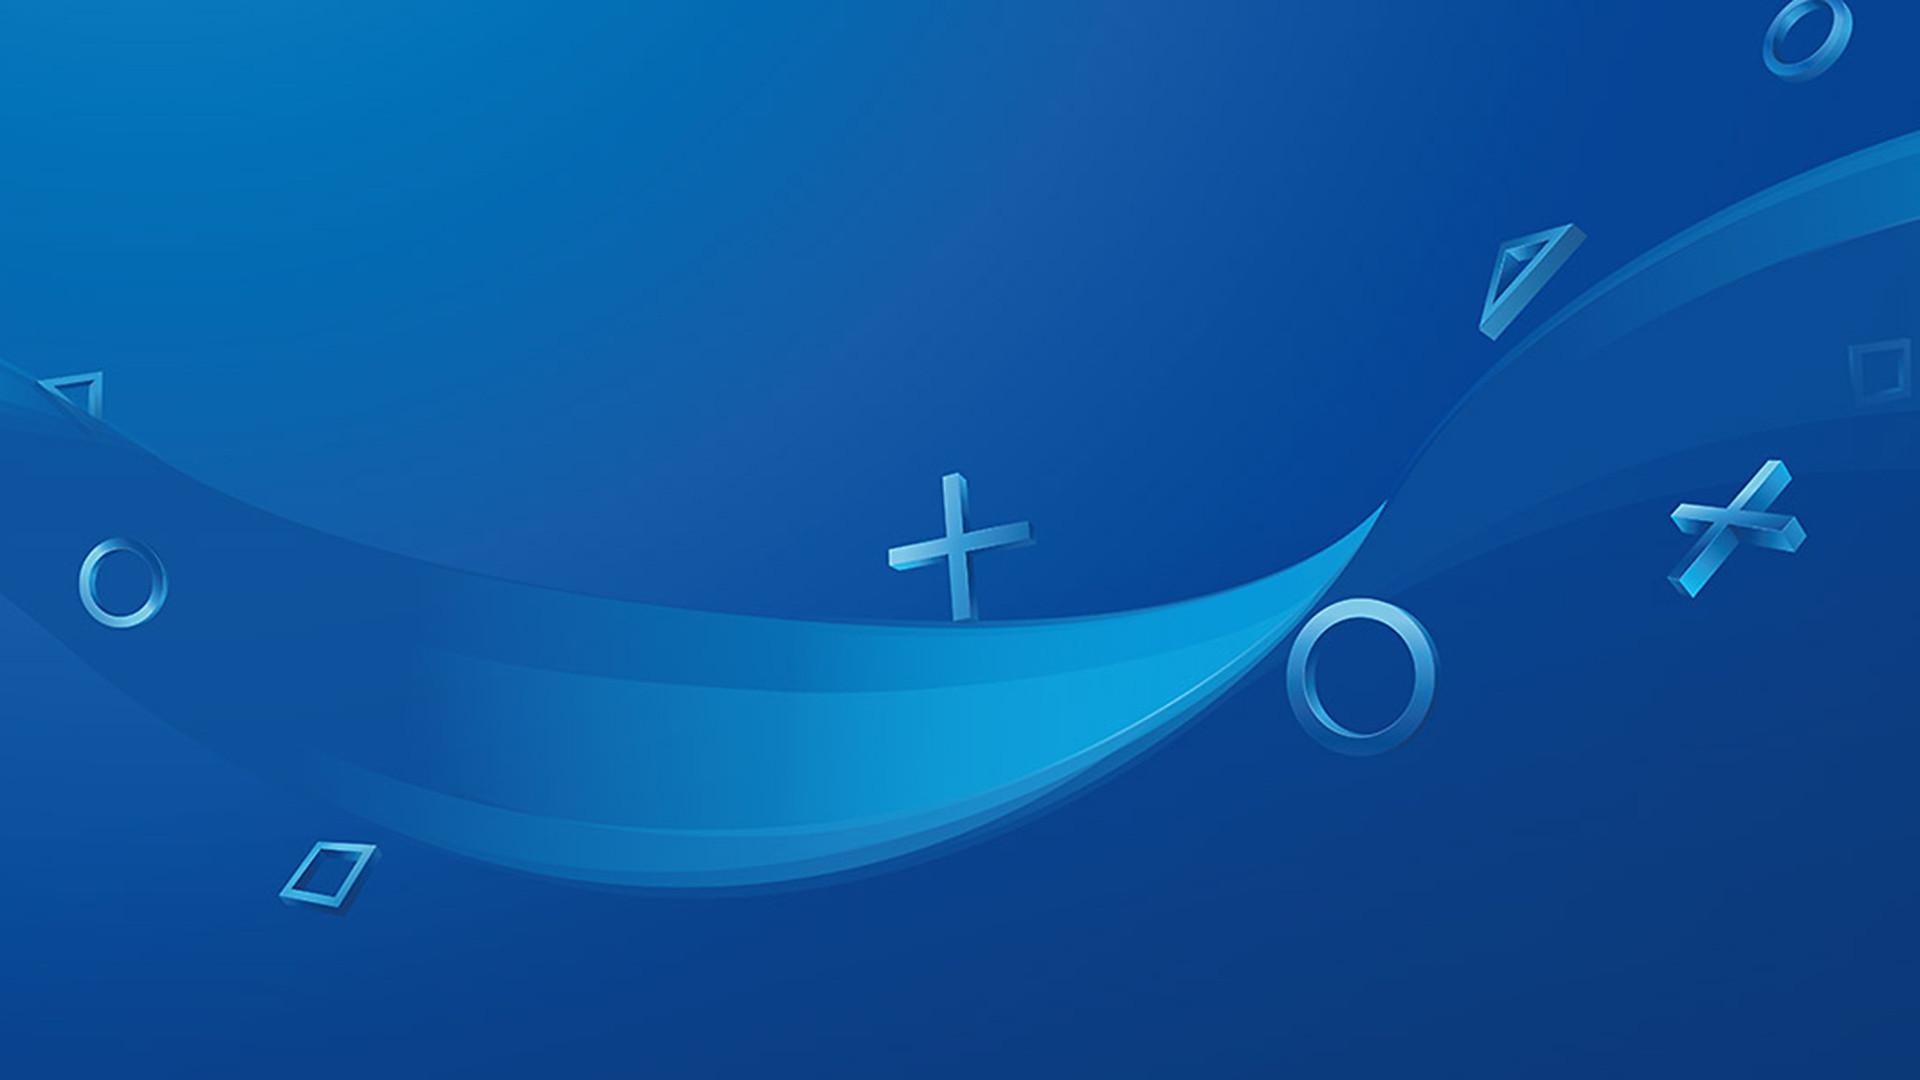 PlayStation 4 Background